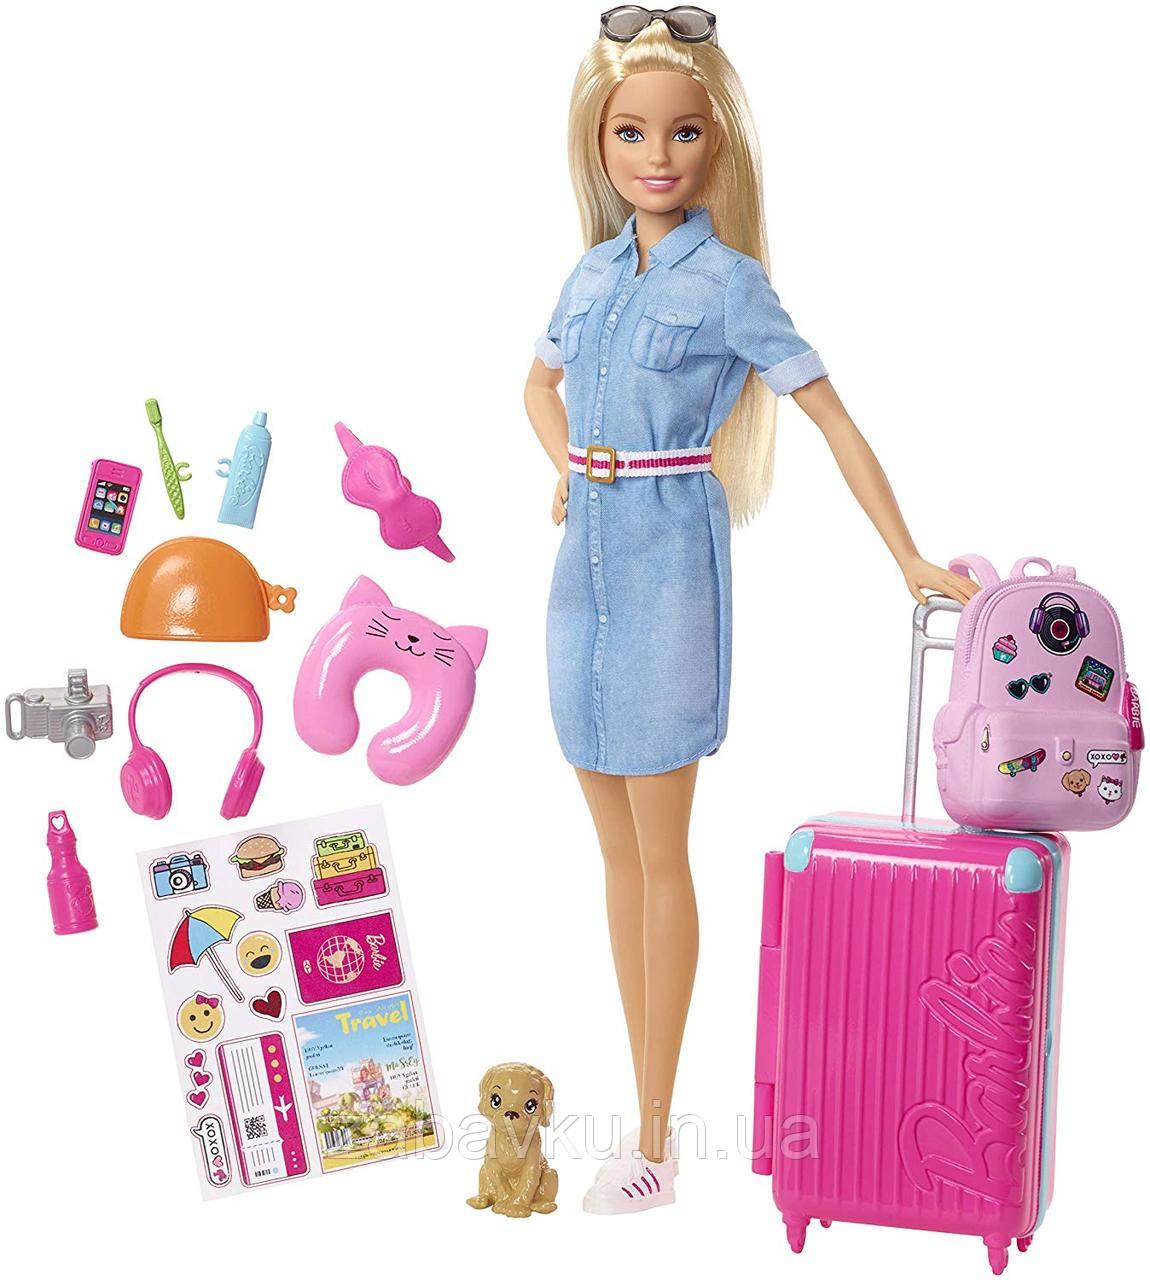 Лялька Барбі подорож набір Barbie Travel Doll & Accessories, Blonde